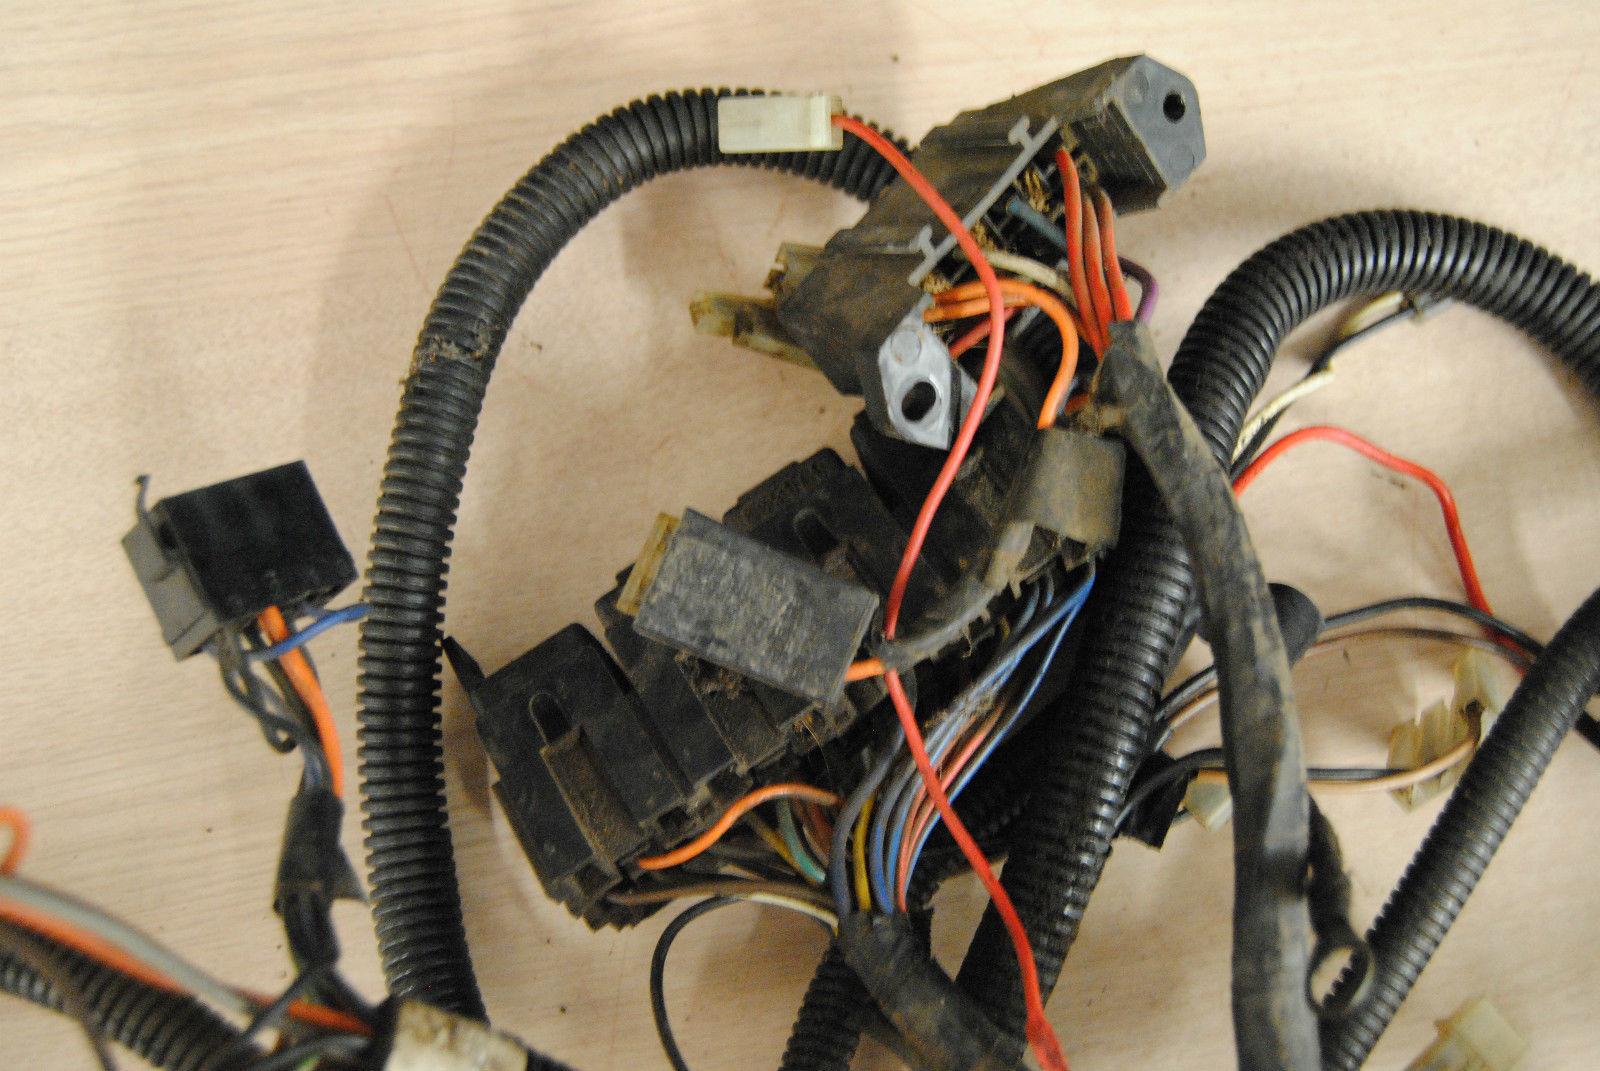 hight resolution of toro wheel horse 72102 wiring harness and 50 similar items mix toro wheel horse 72102 wiring